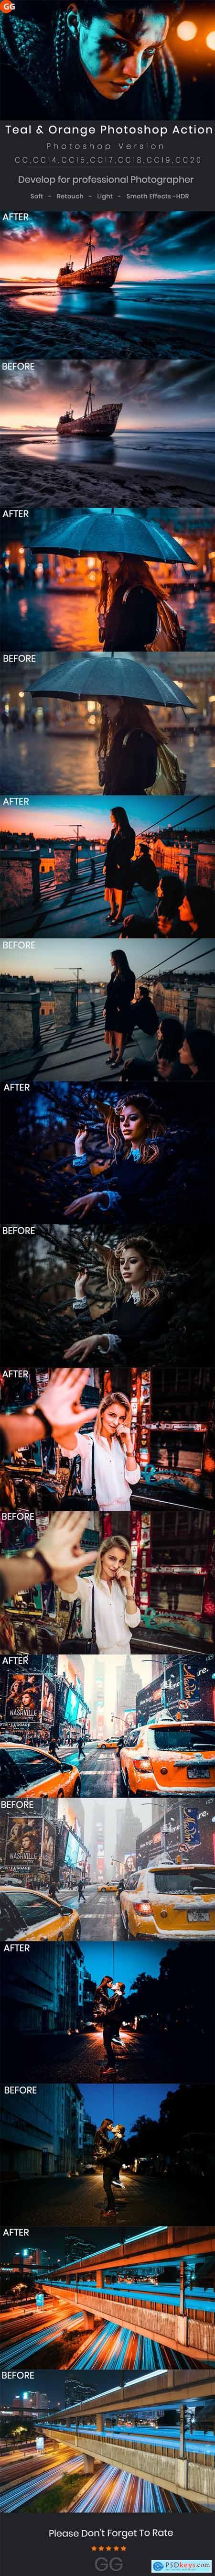 Teal & Orange Photoshop Action 28975559